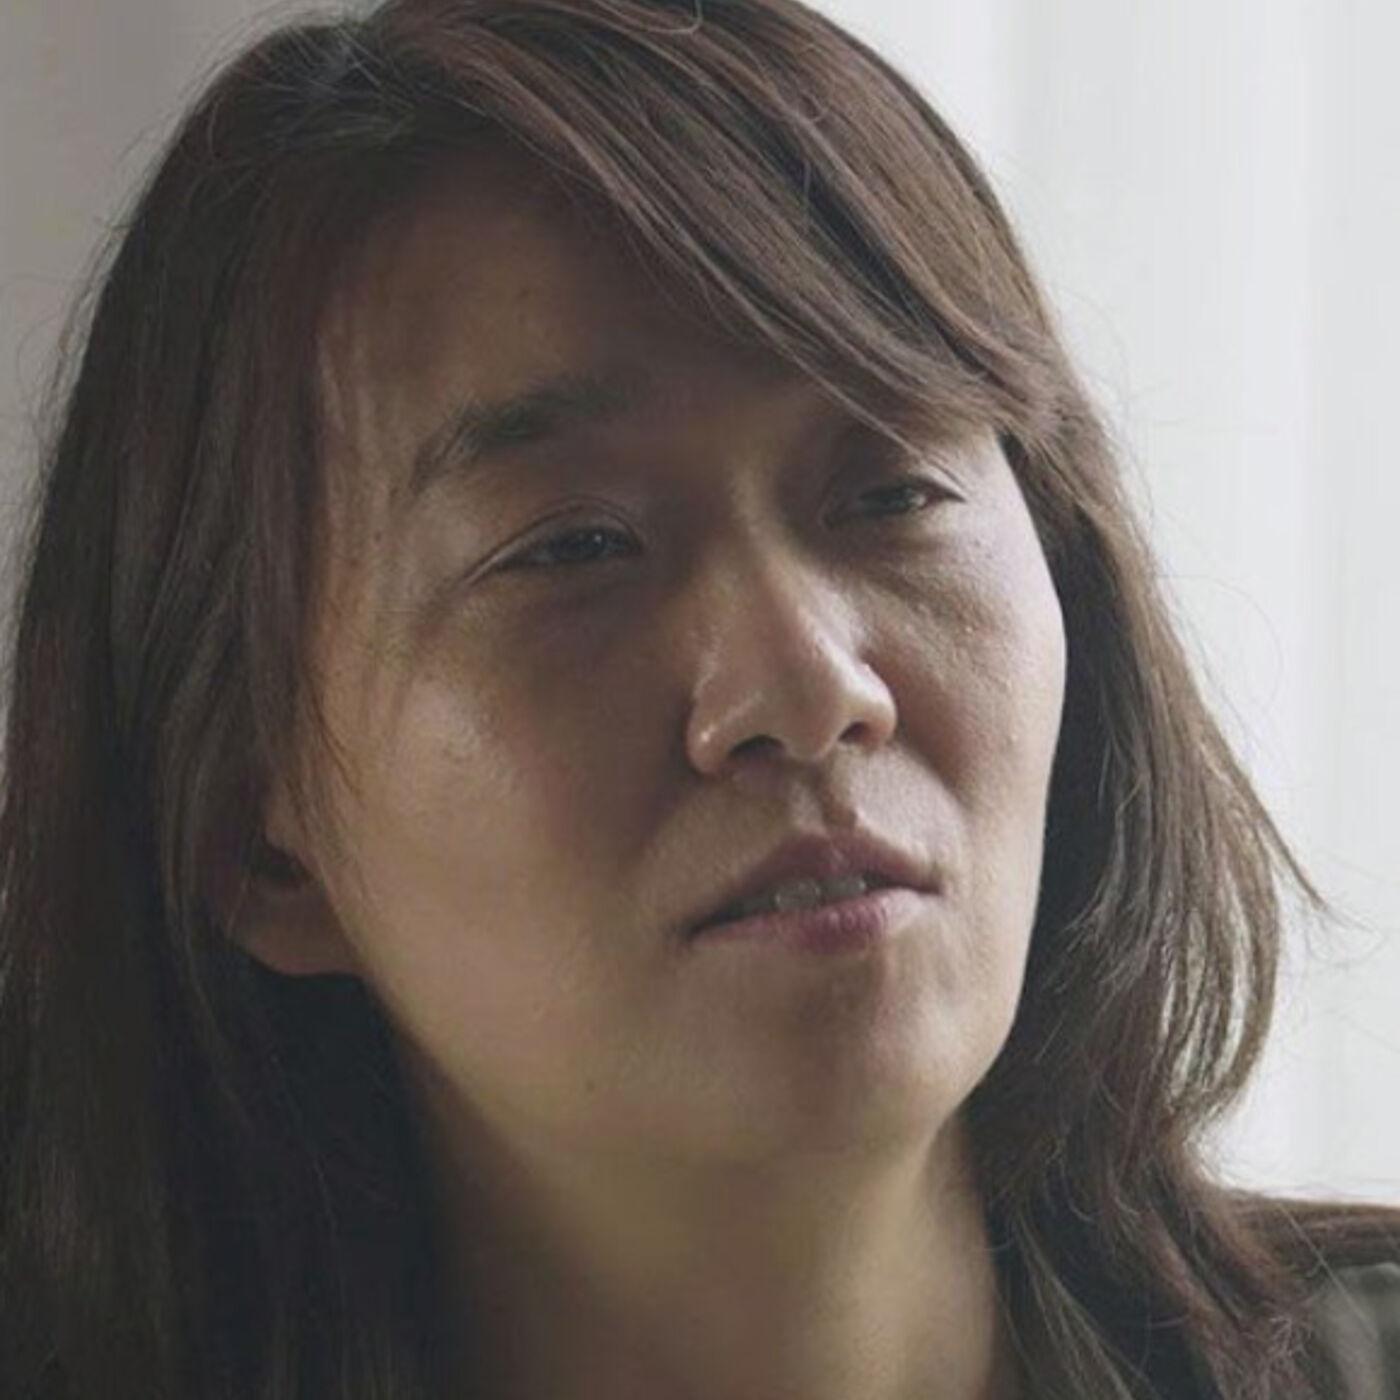 Han Kang: The Horror of Humanity